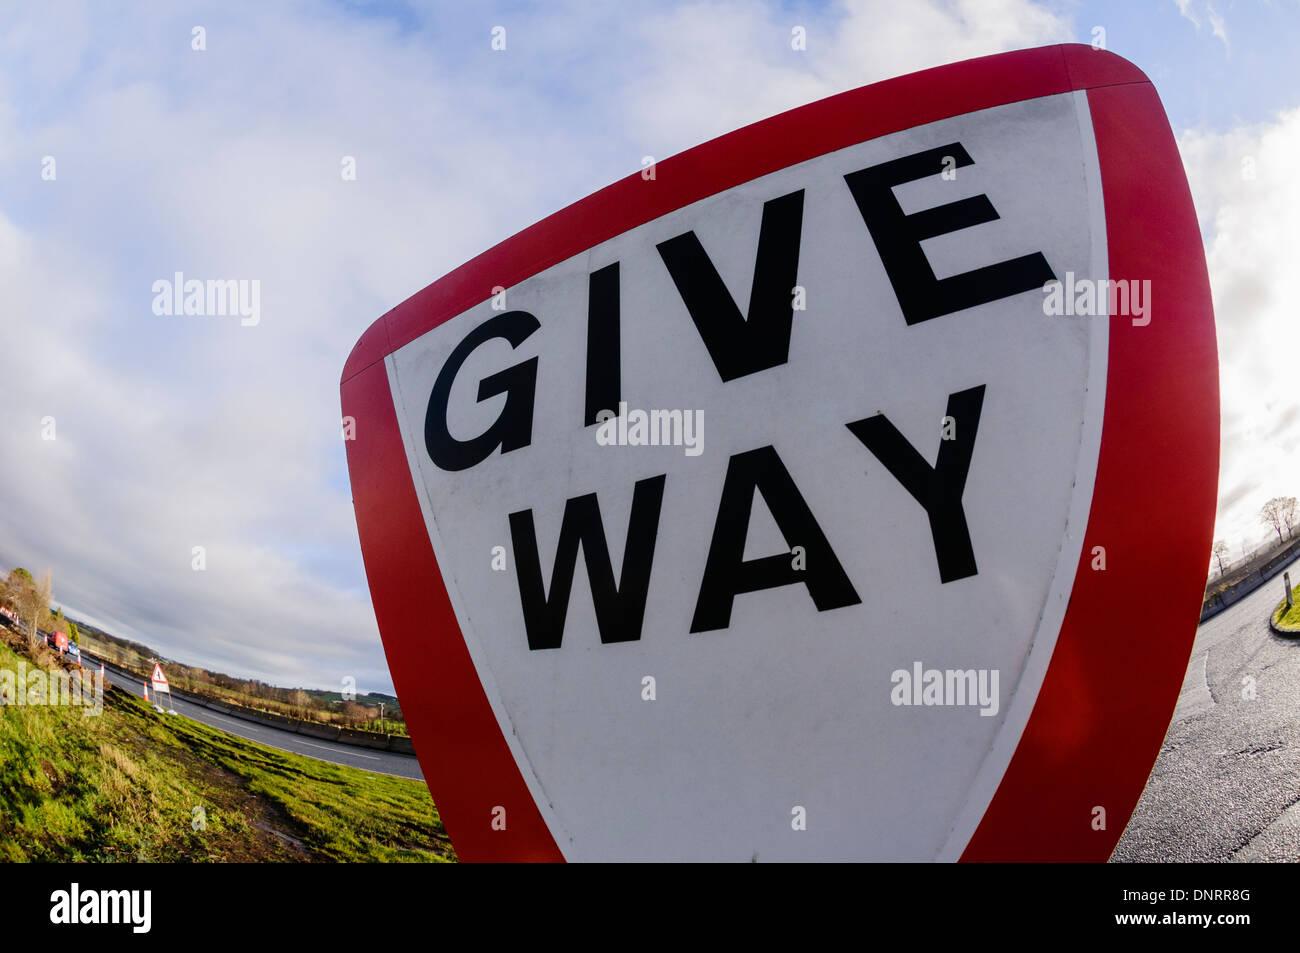 Give Way sign - Stock Image